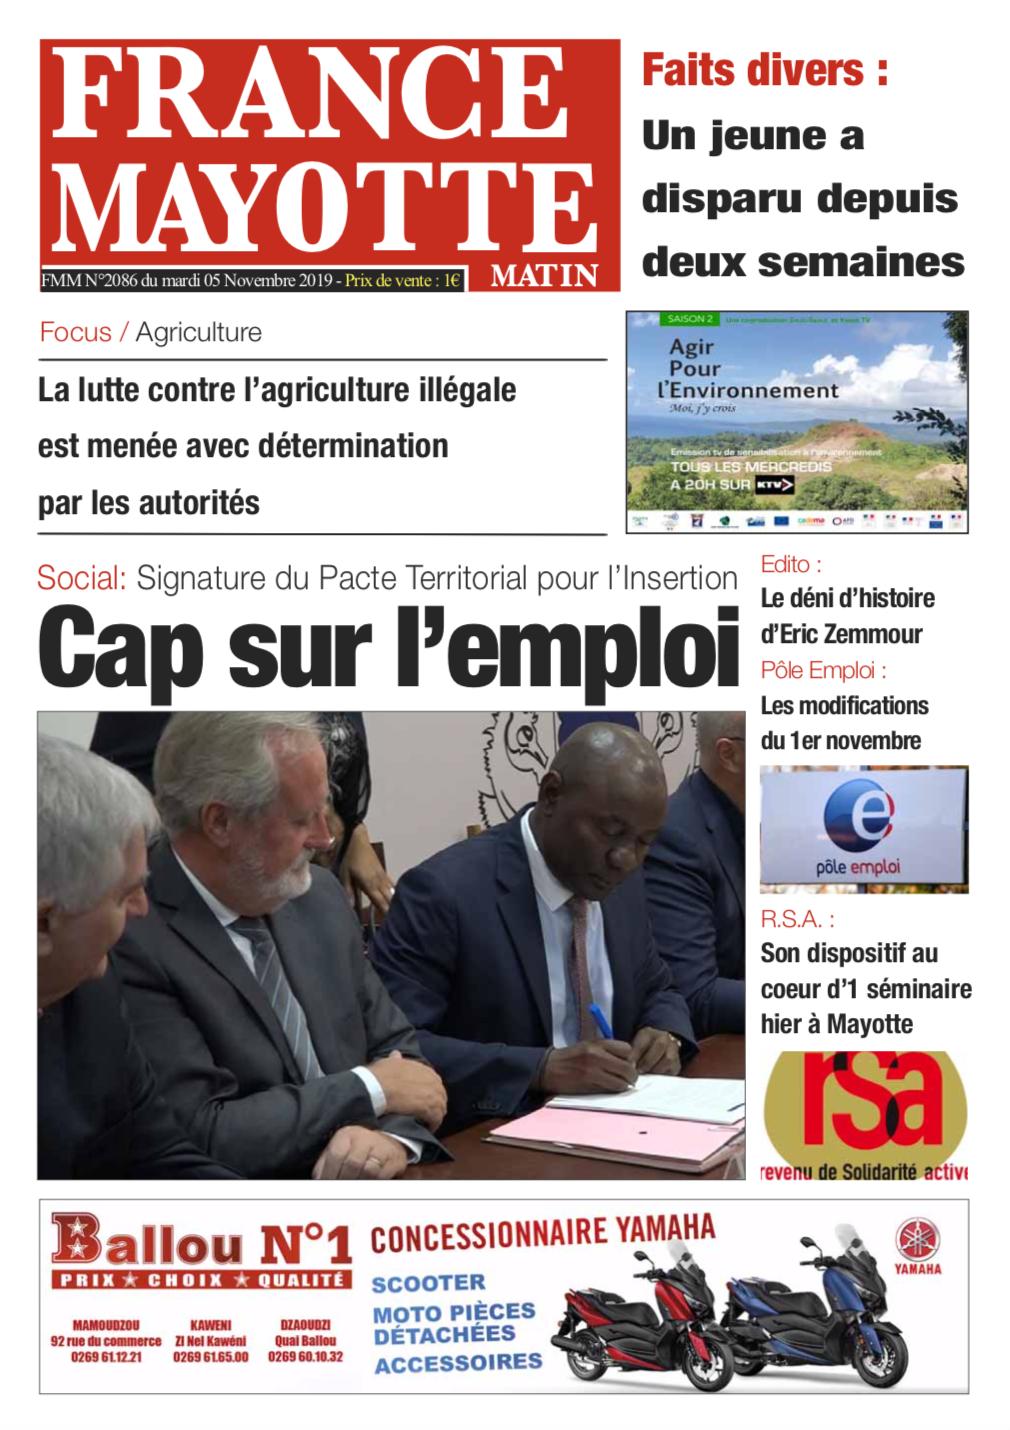 France Mayotte Mardi 5 novembre 2019